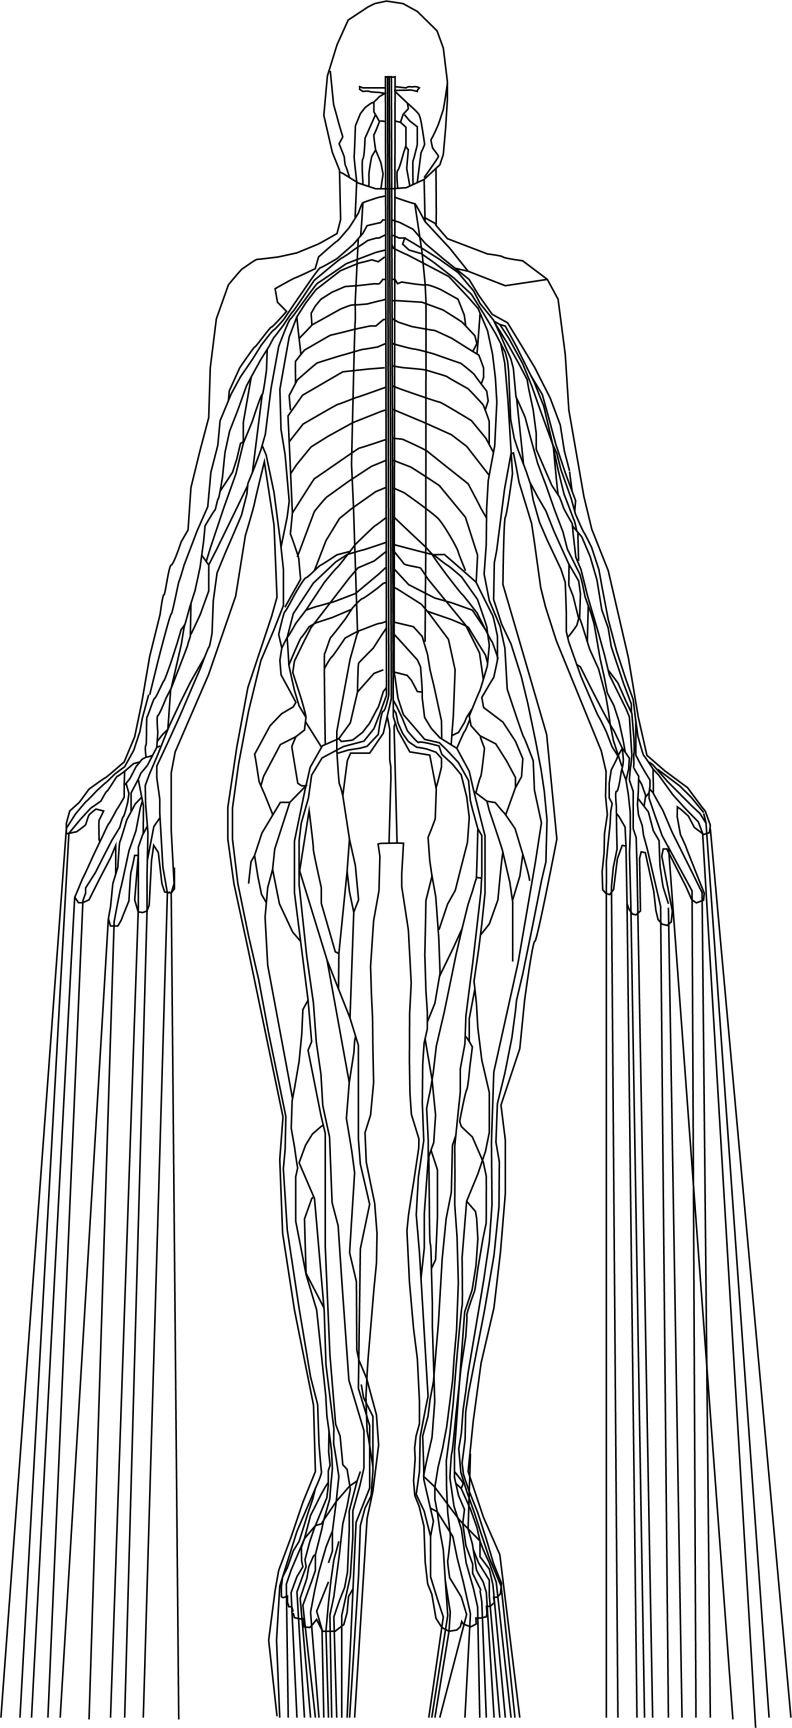 NerveSystem